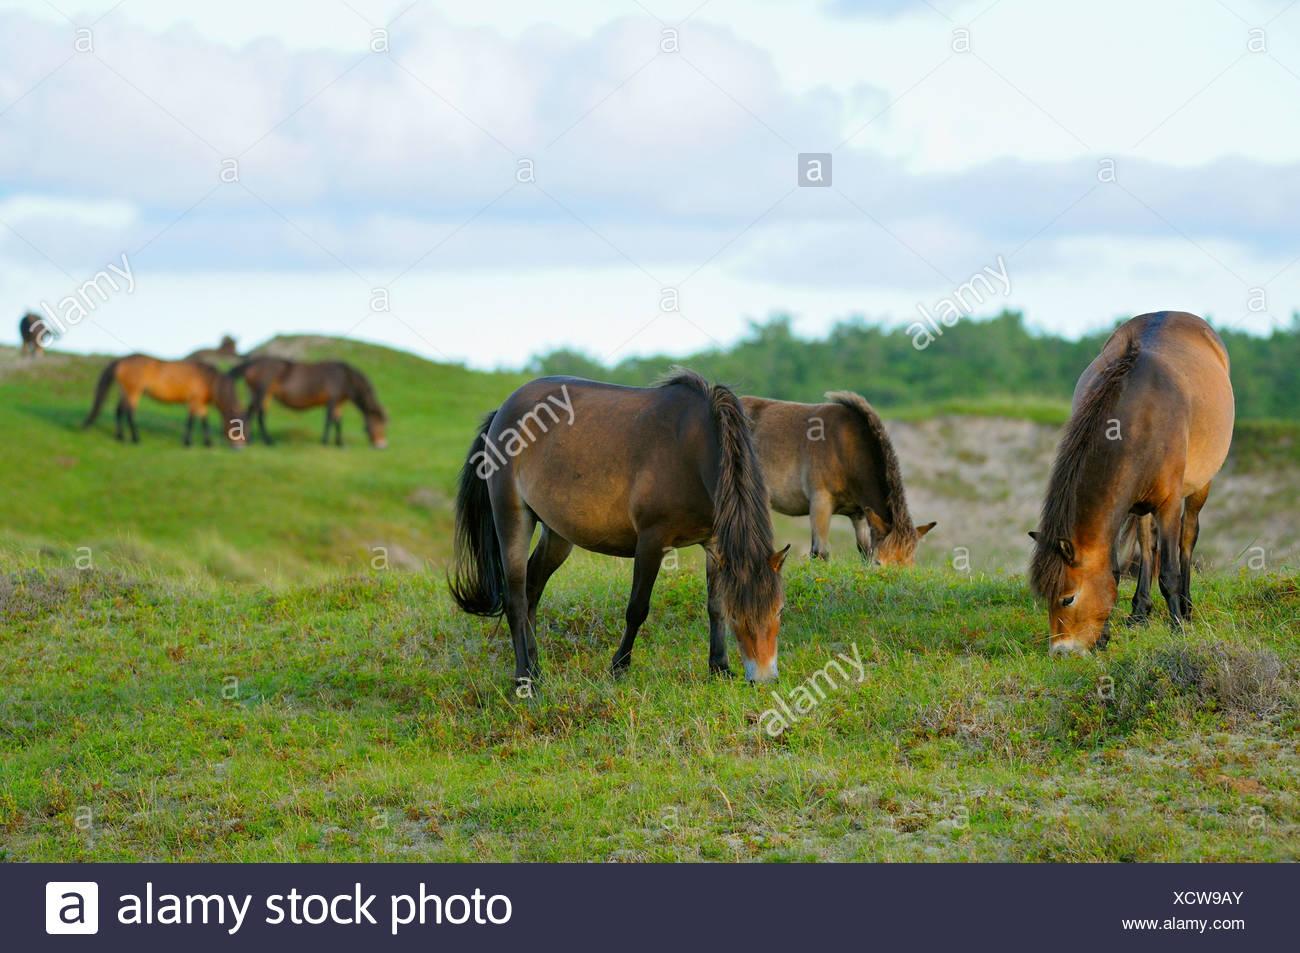 Exmoor pony (Equus przewalskii f. caballus), herd of horses grazing in the conservation area Bollekamer, Netherlands, Texel, Duenen von Texel Nationalpark - Stock Image